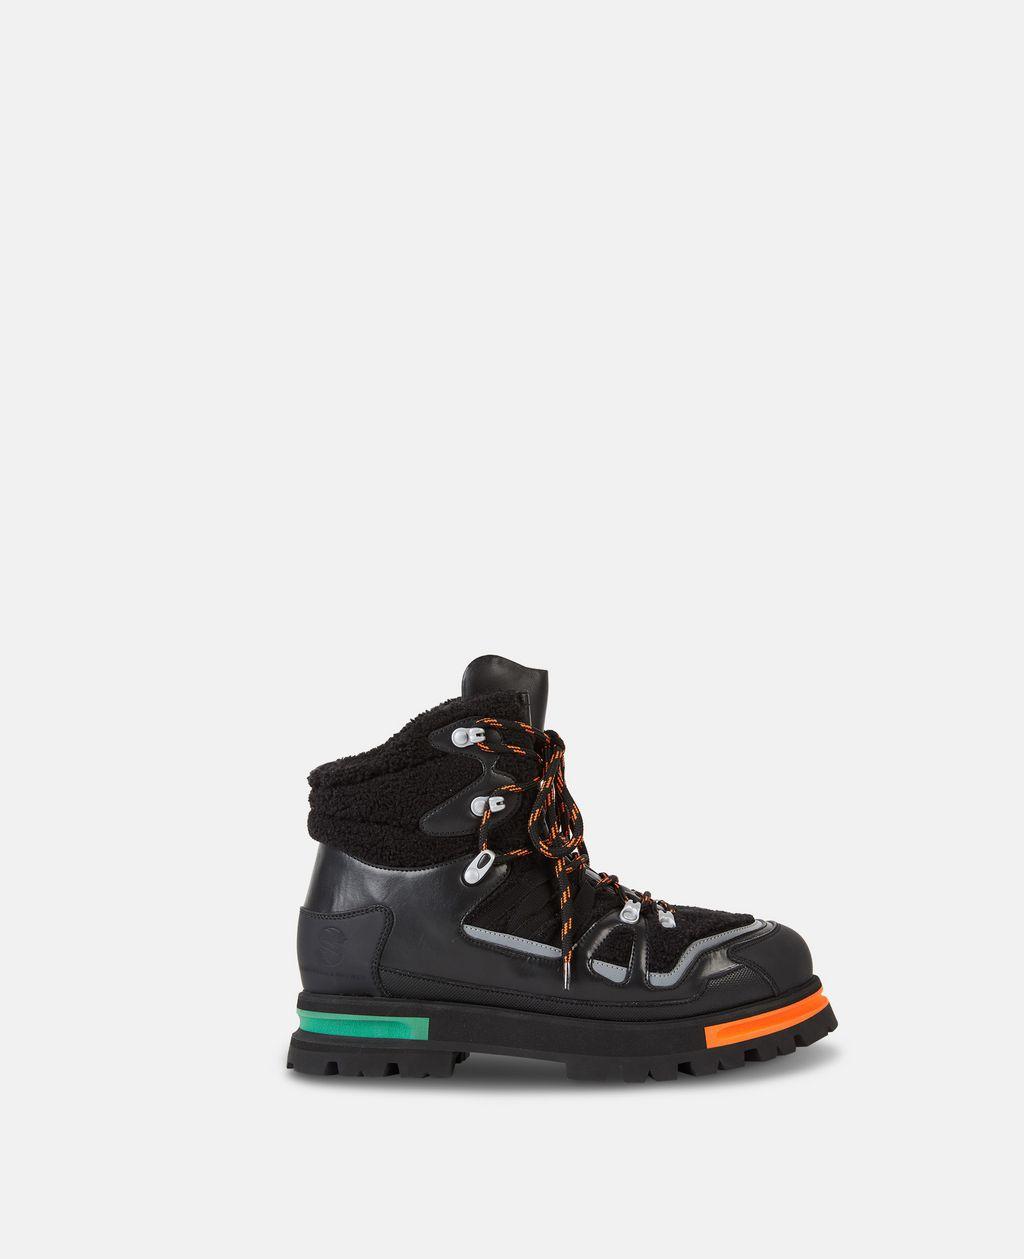 Stella Mccartney Black Mountain Boots